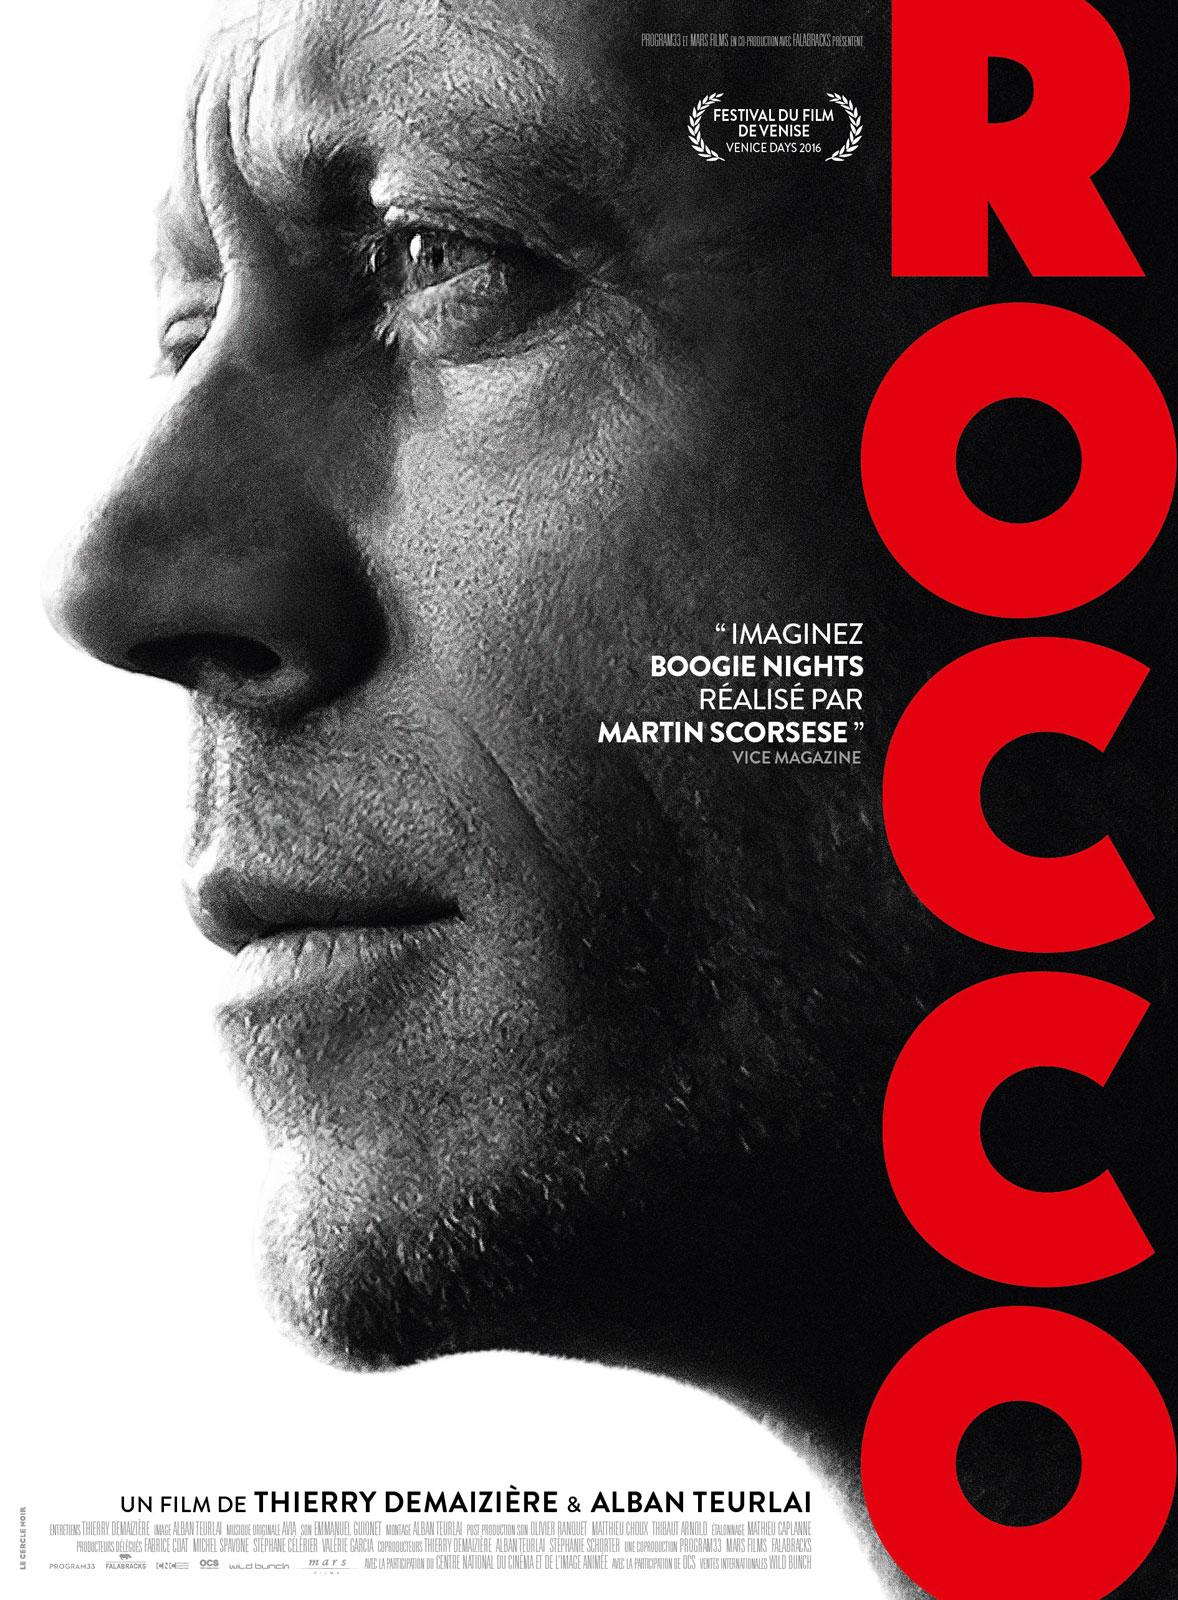 Rocco İncelemesi